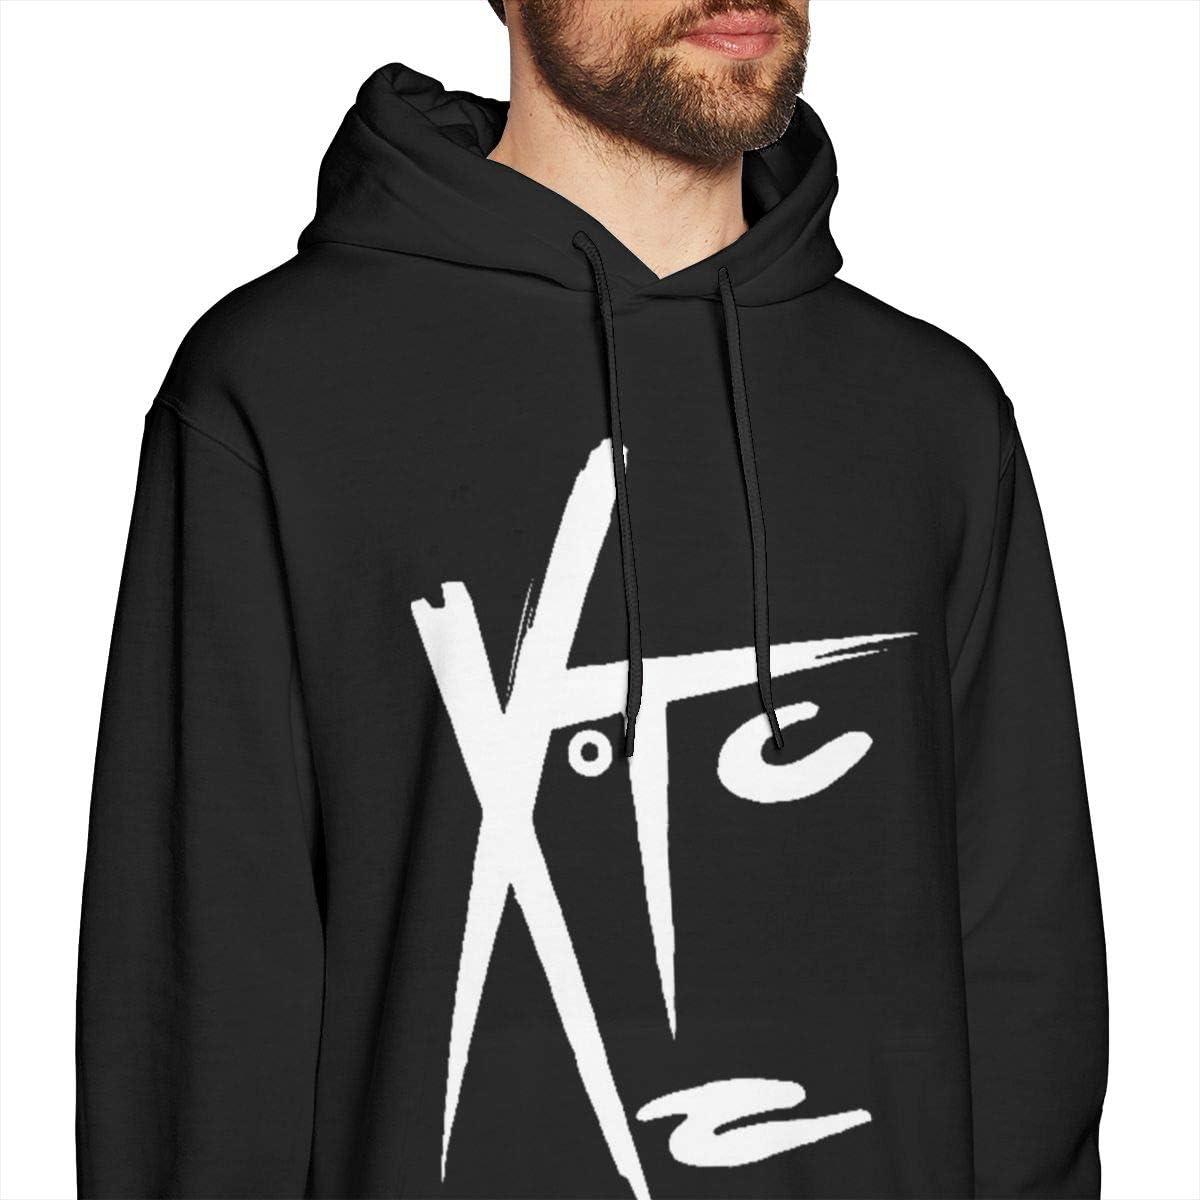 Luomingg XTC Band Mens Comfortable Sweatshirt Black